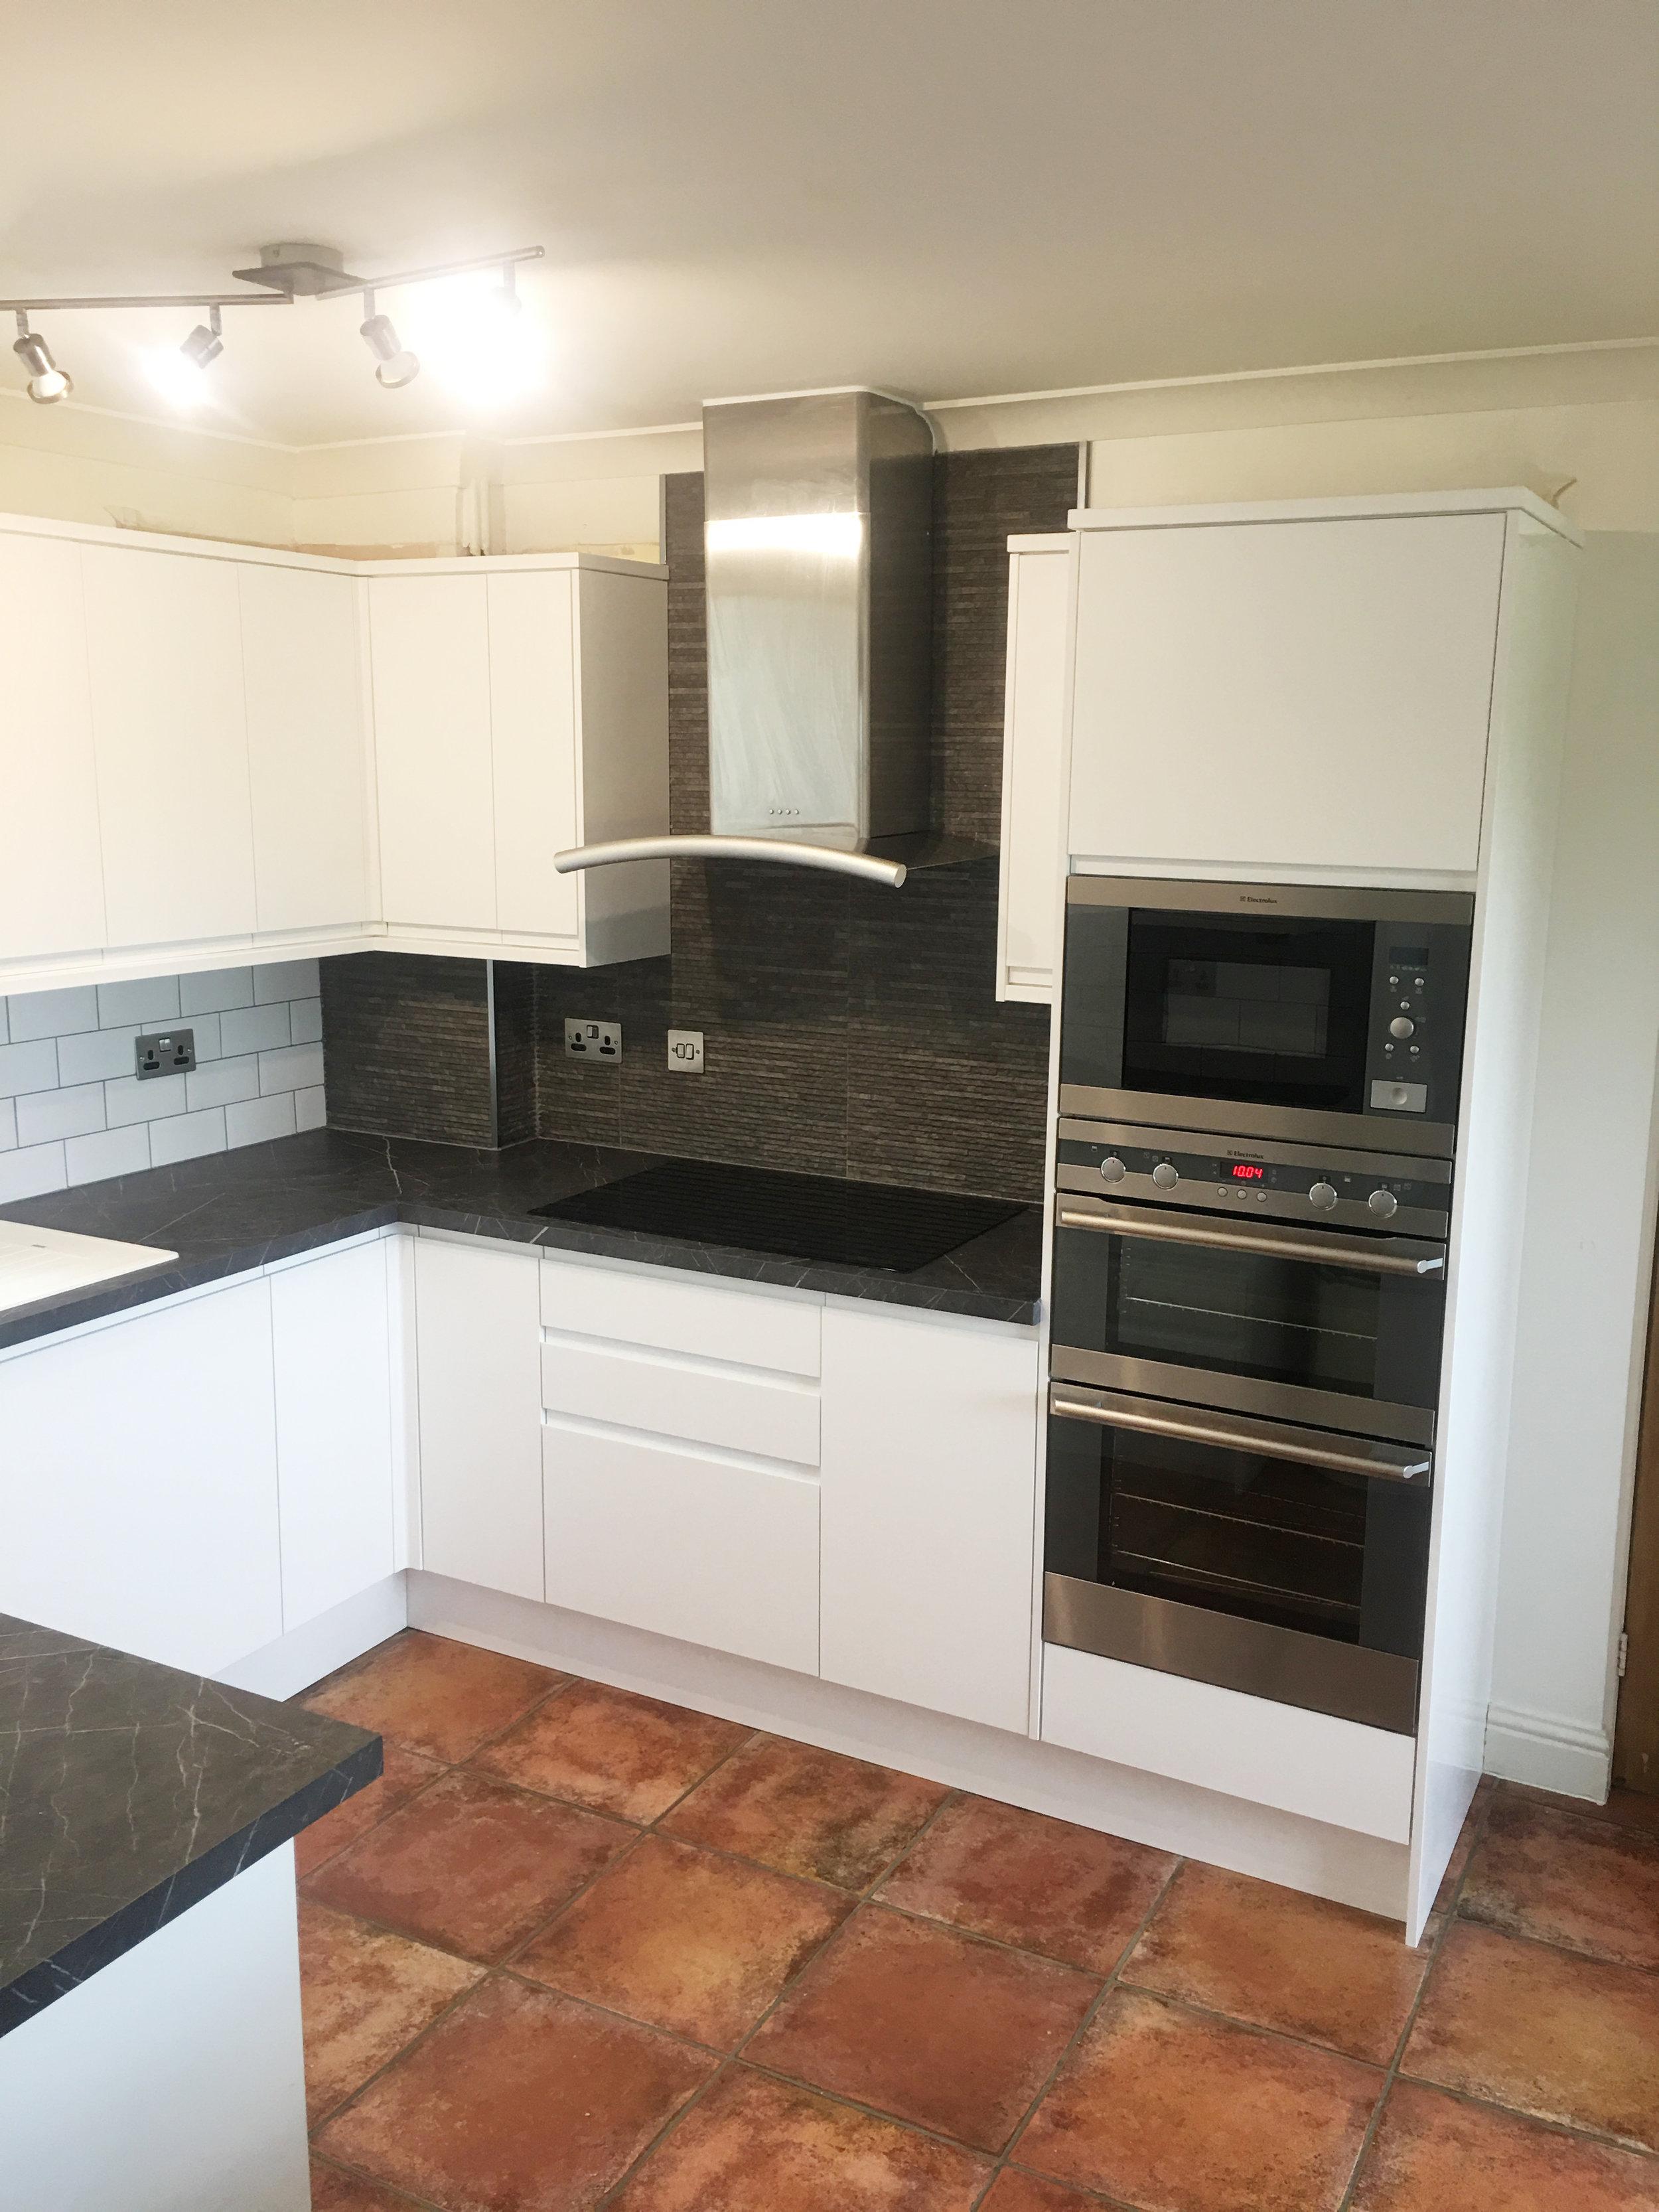 Full kitchen installations